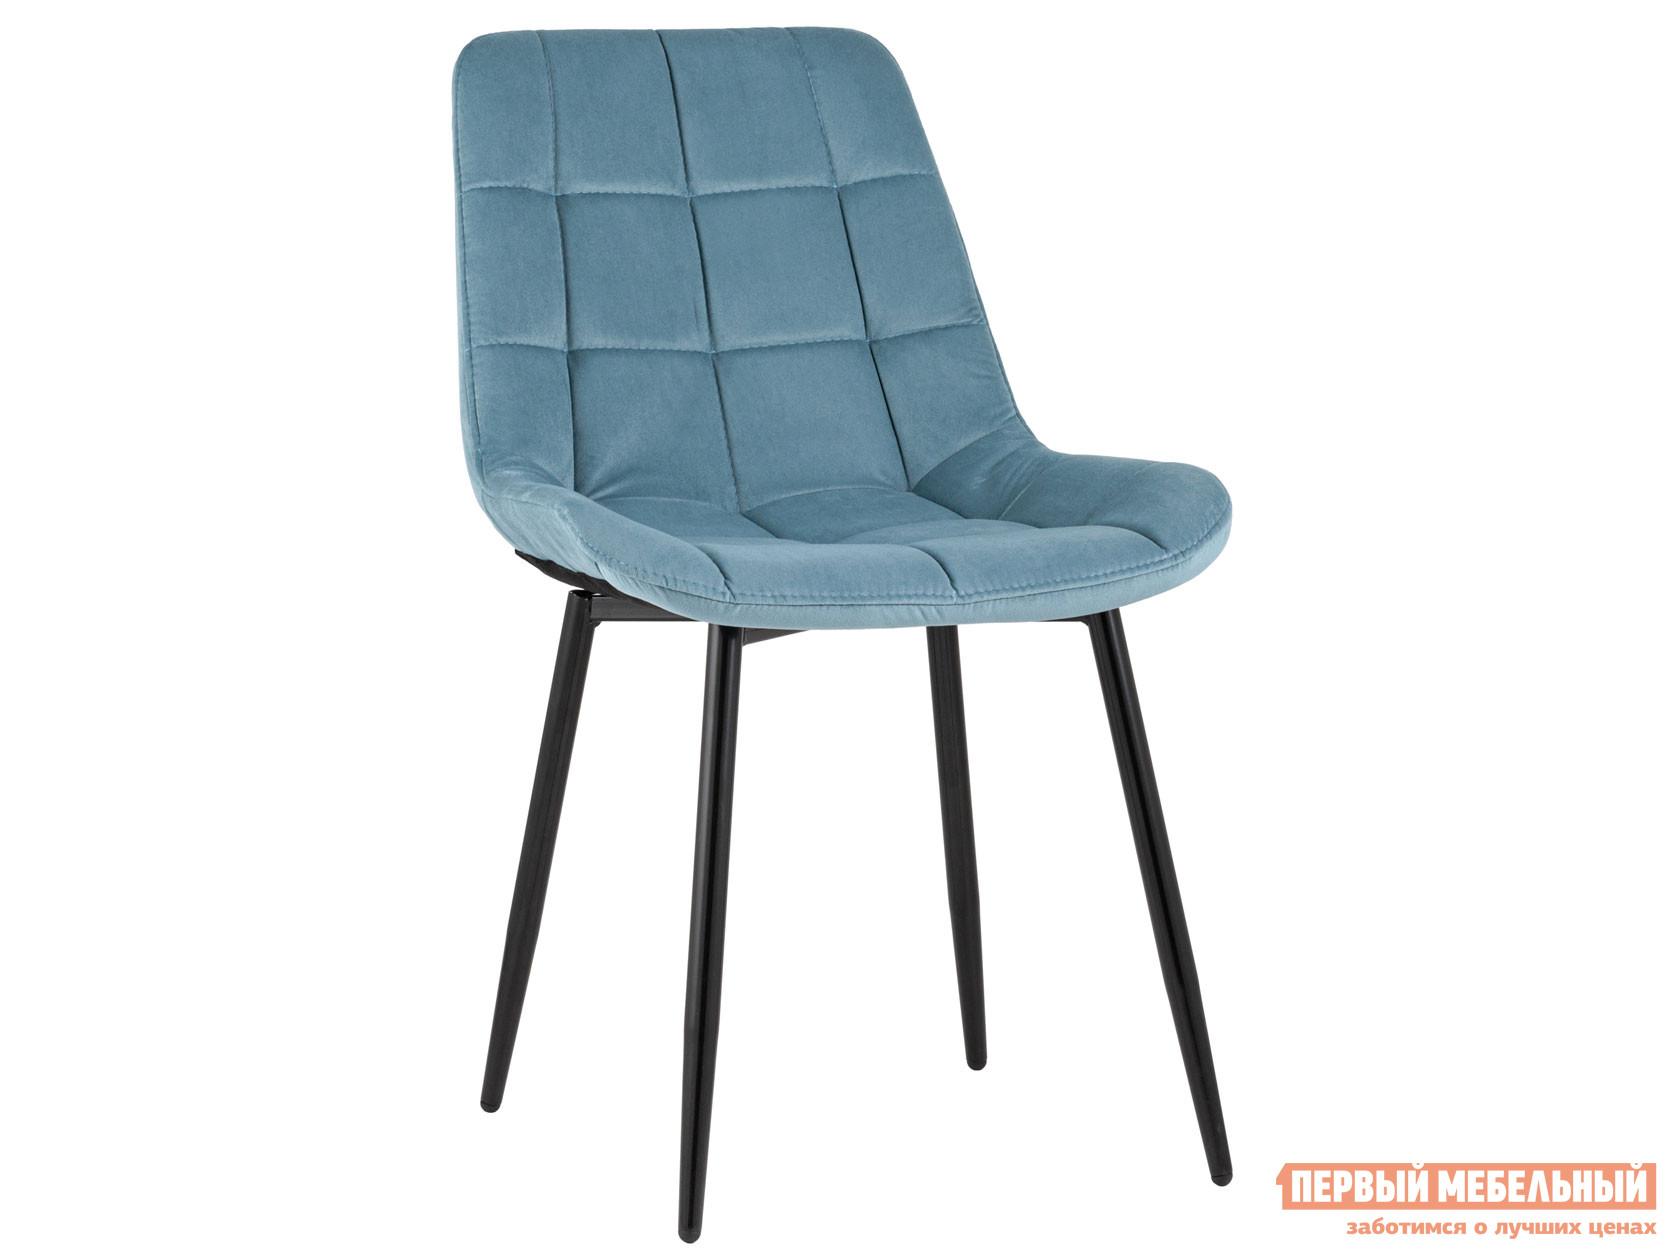 Стул  Флекс велюр Пыльно-голубой, / Черный, металл STOOL GROUP 119472